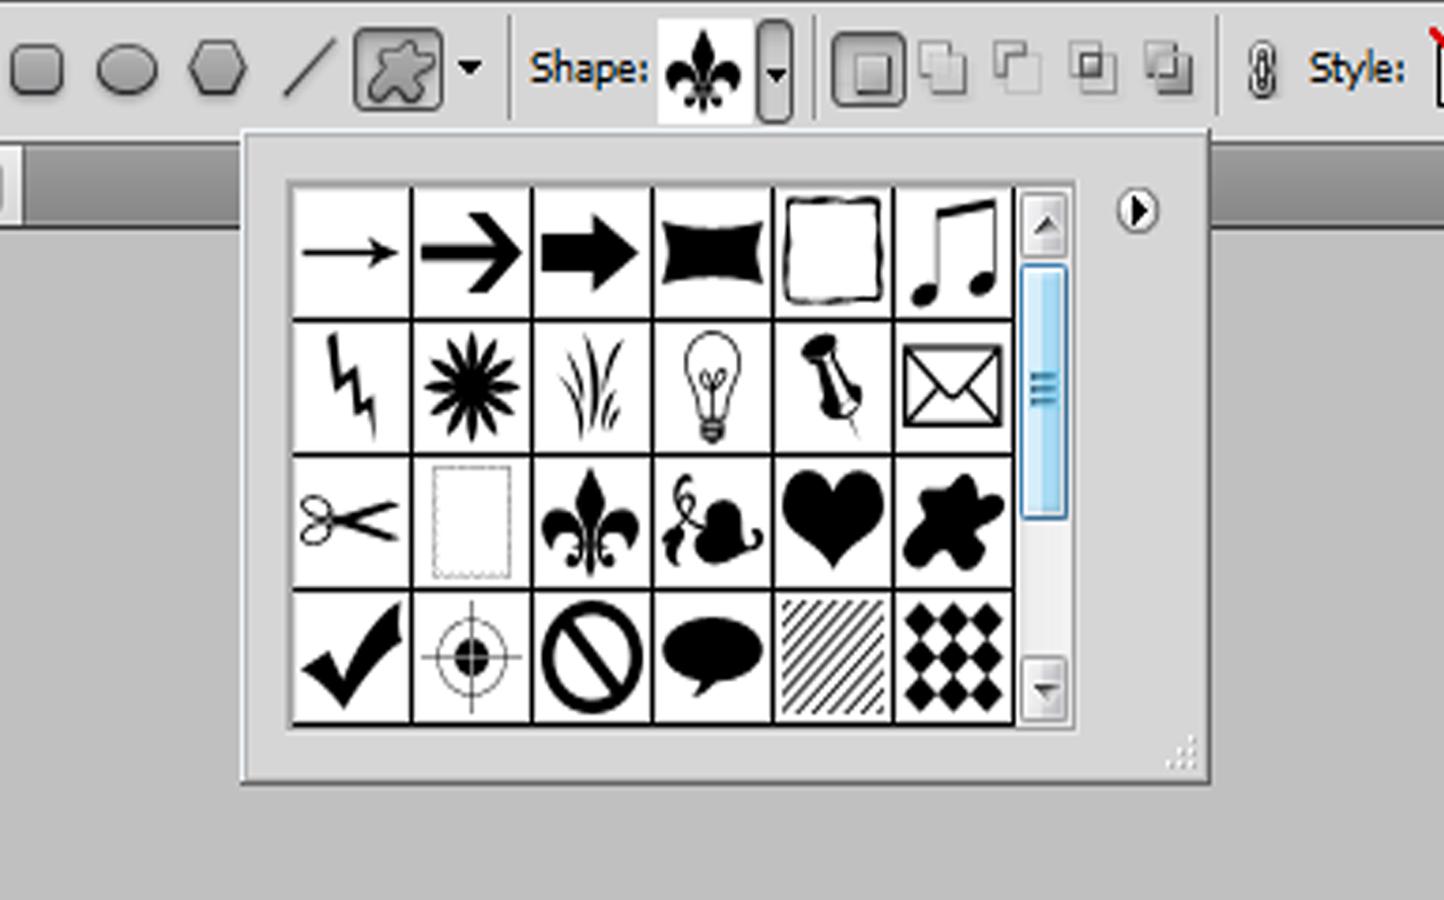 Creating a Custom Shape in Photoshop